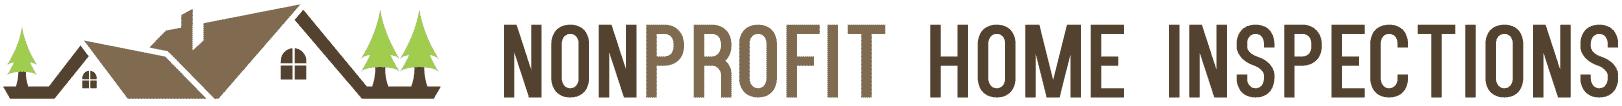 Nonprofit Home Inspections Retina Logo